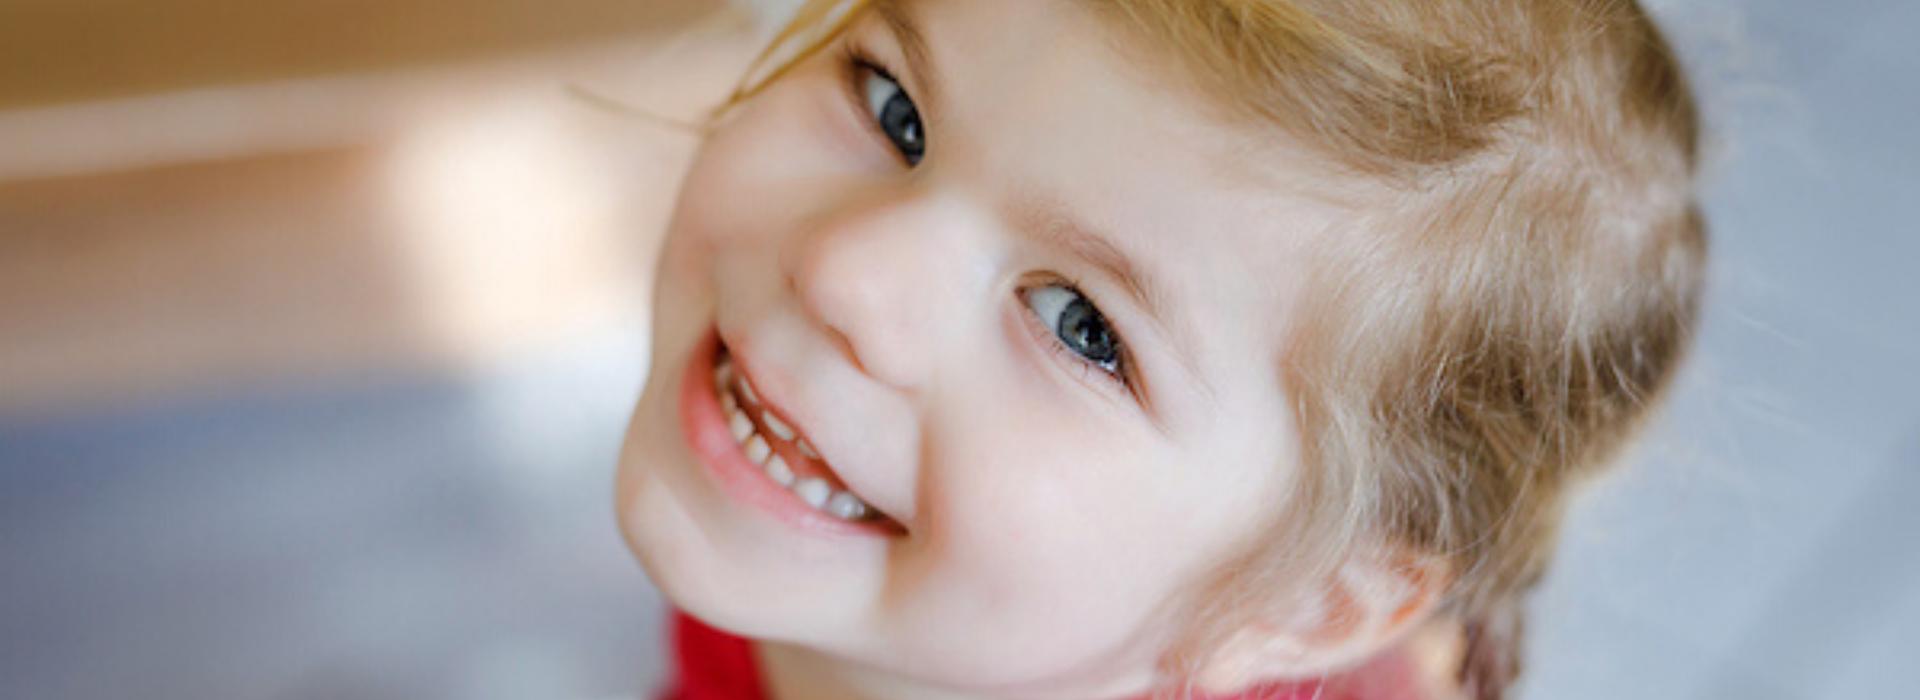 COVID 19 Response - Pediatric Partners of Virginia